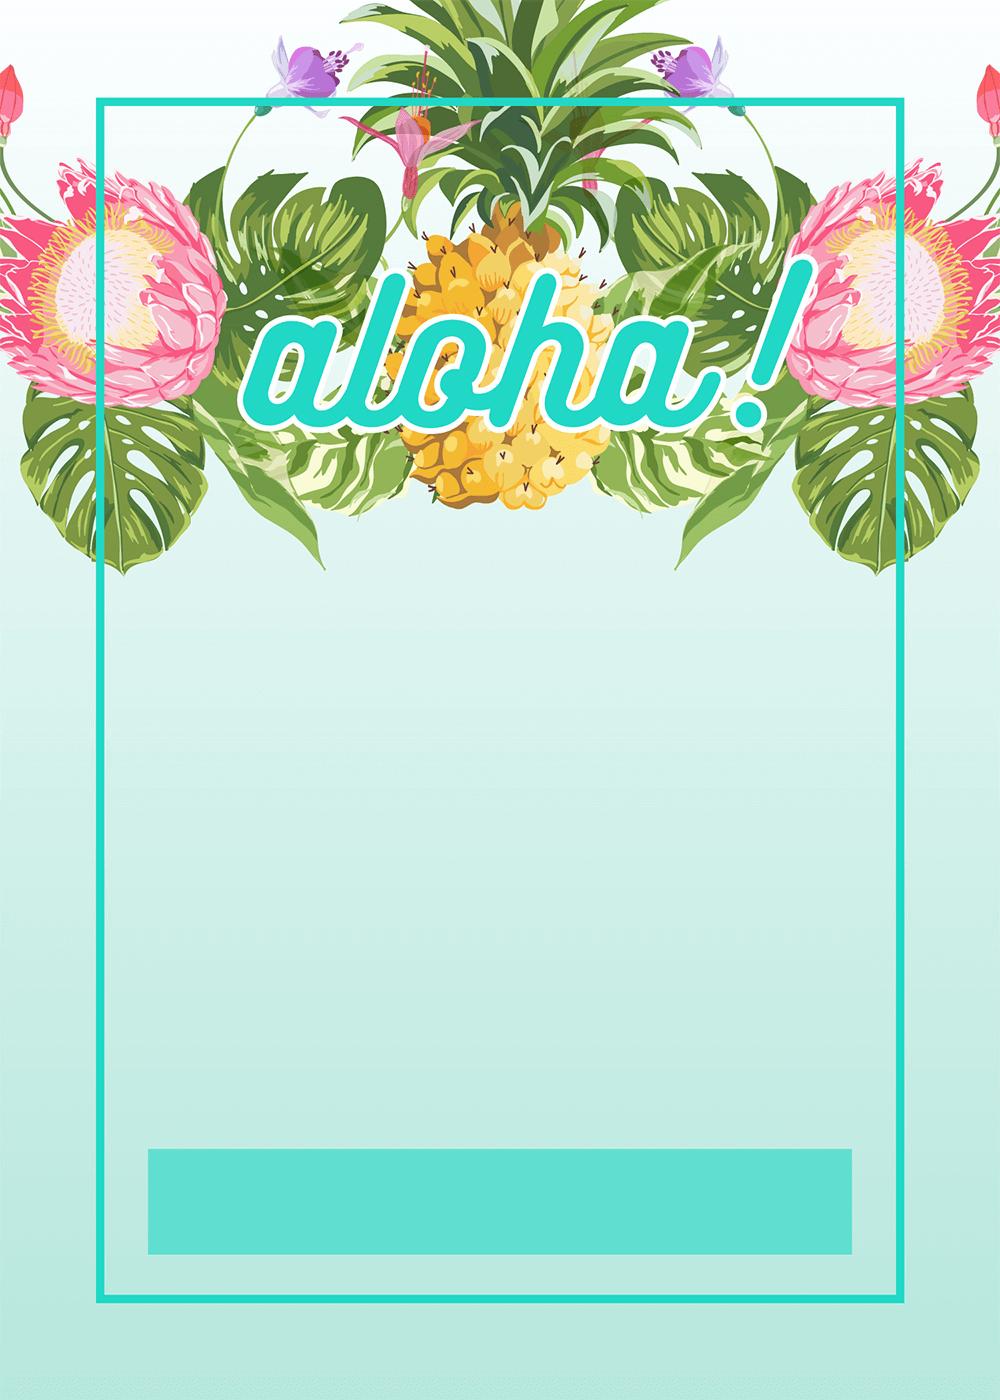 Pineapple Luau Perimeter - Free Printable Birthday Invitation - Free Printable Pineapple Invitations